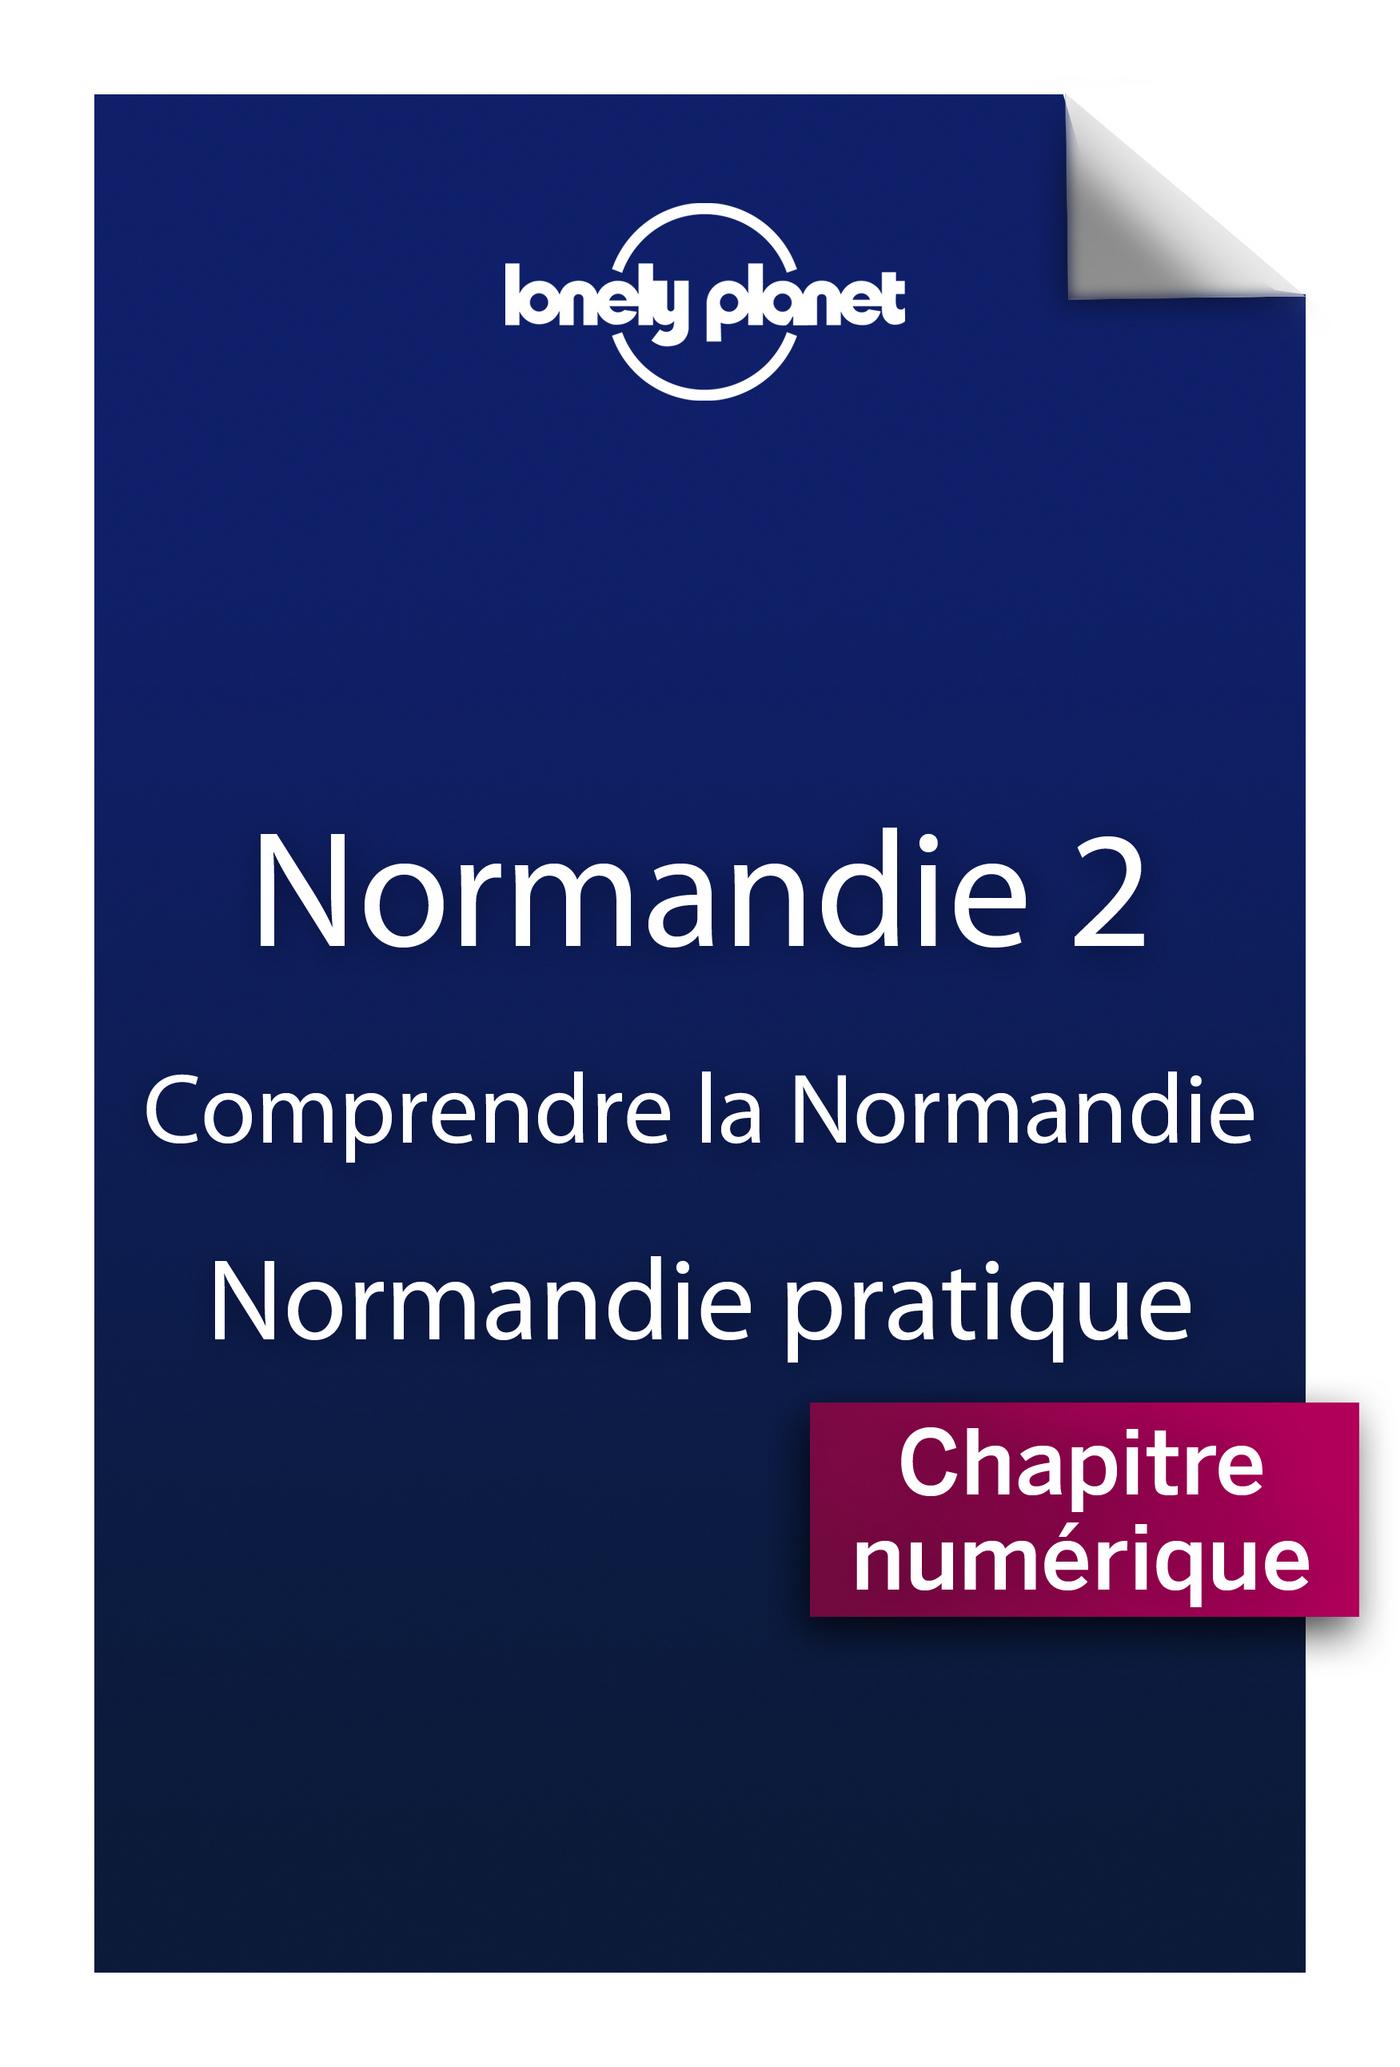 Normandie 2 - Comprendre la Normandie et Normandie pratique